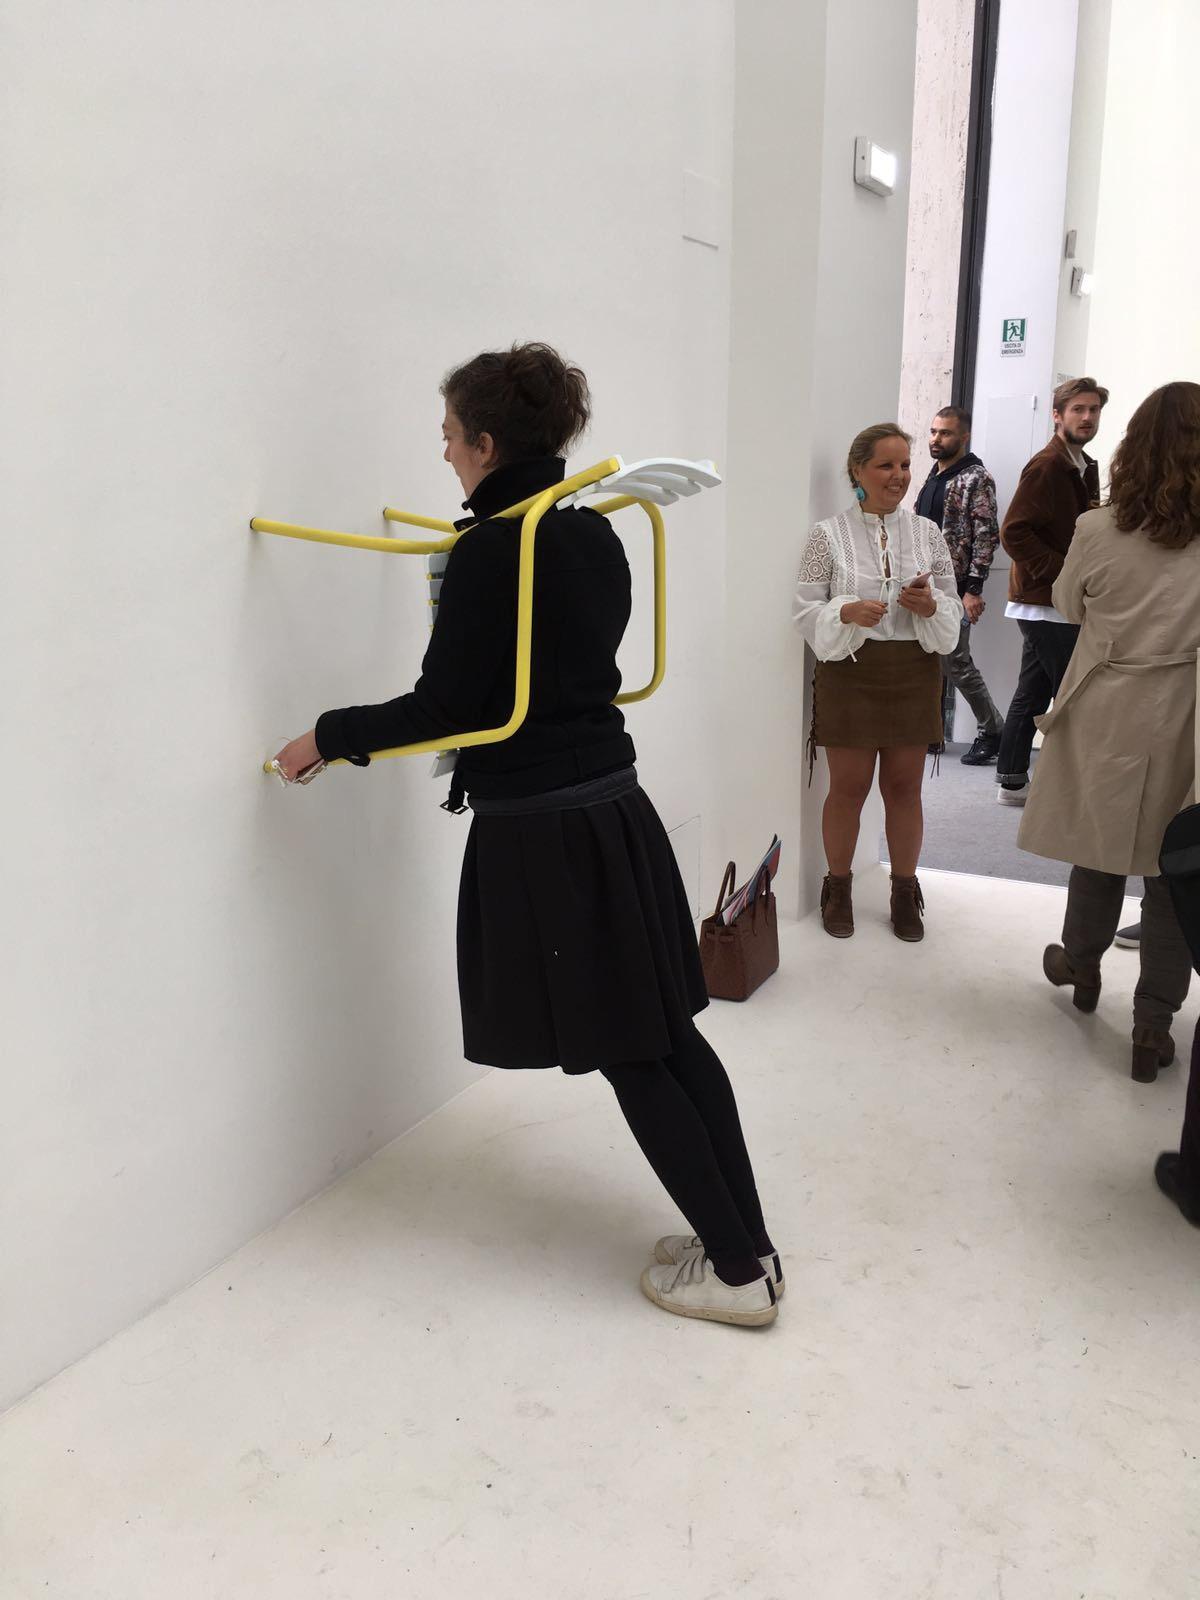 one-minute-sculpture-erwin-wurm-biennale-venise